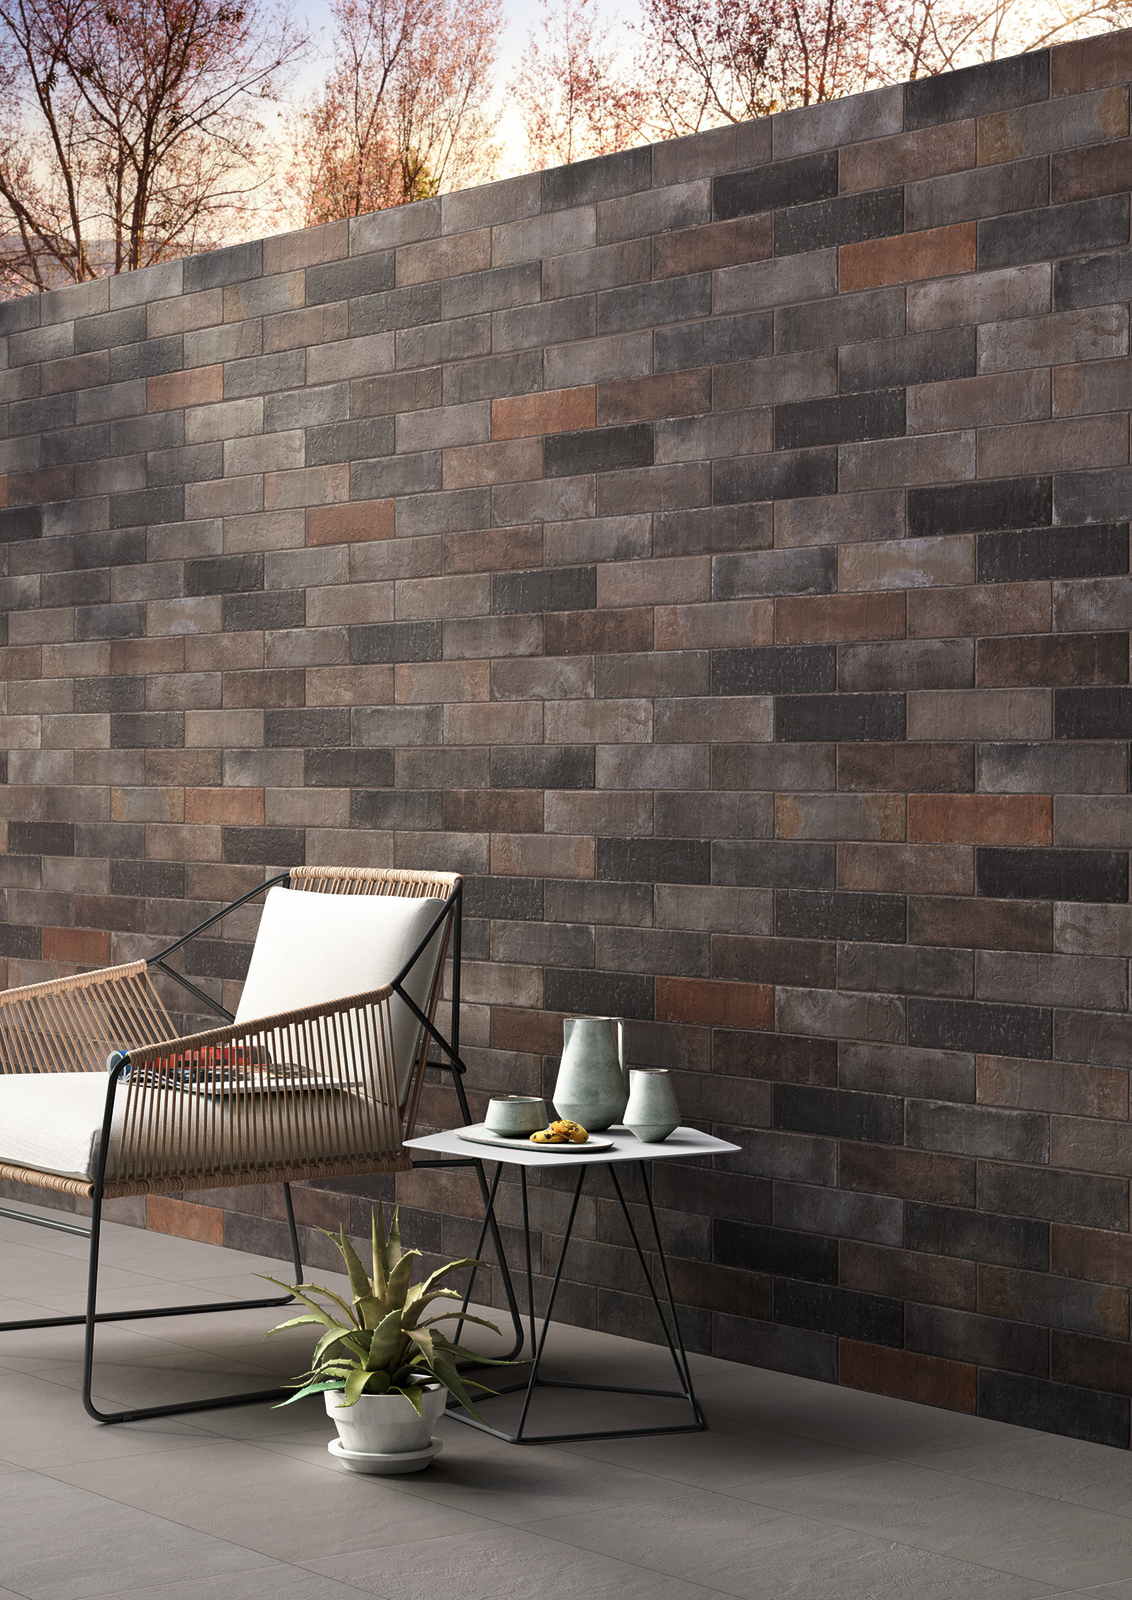 rev tement de sol mur en gr s c rame effet brique terramix by marazzi. Black Bedroom Furniture Sets. Home Design Ideas